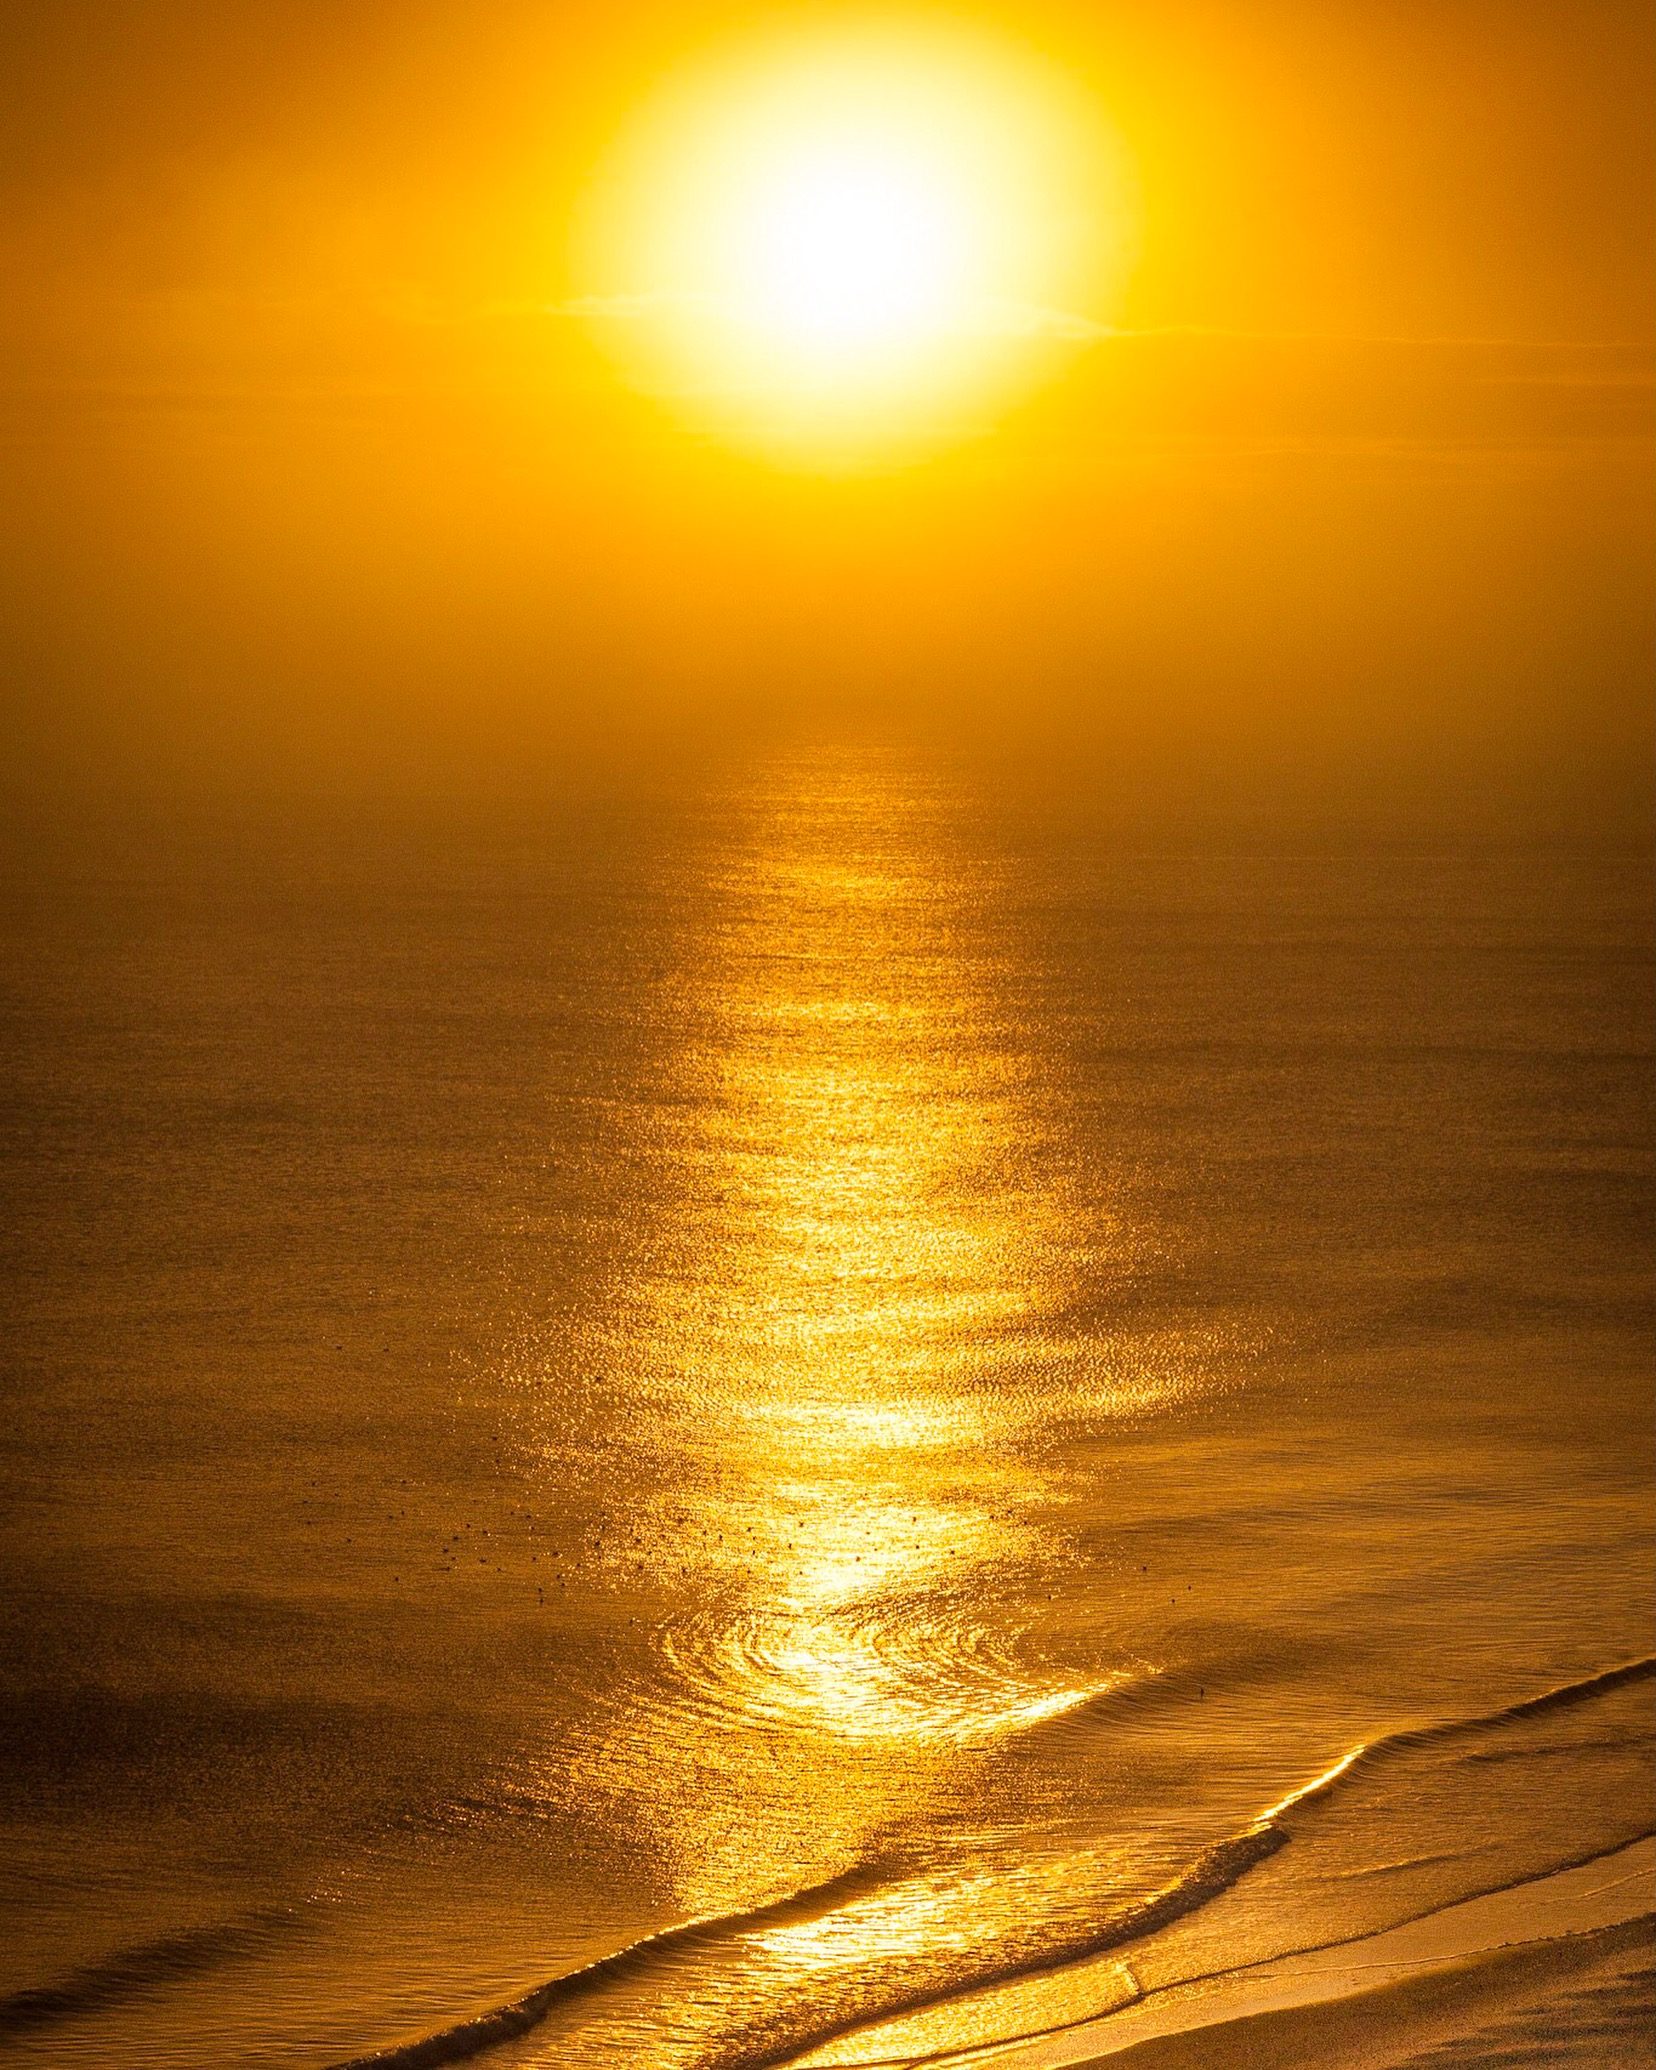 Golden sunshine on the beach by Rick McEvoy Bournemouth Photographer